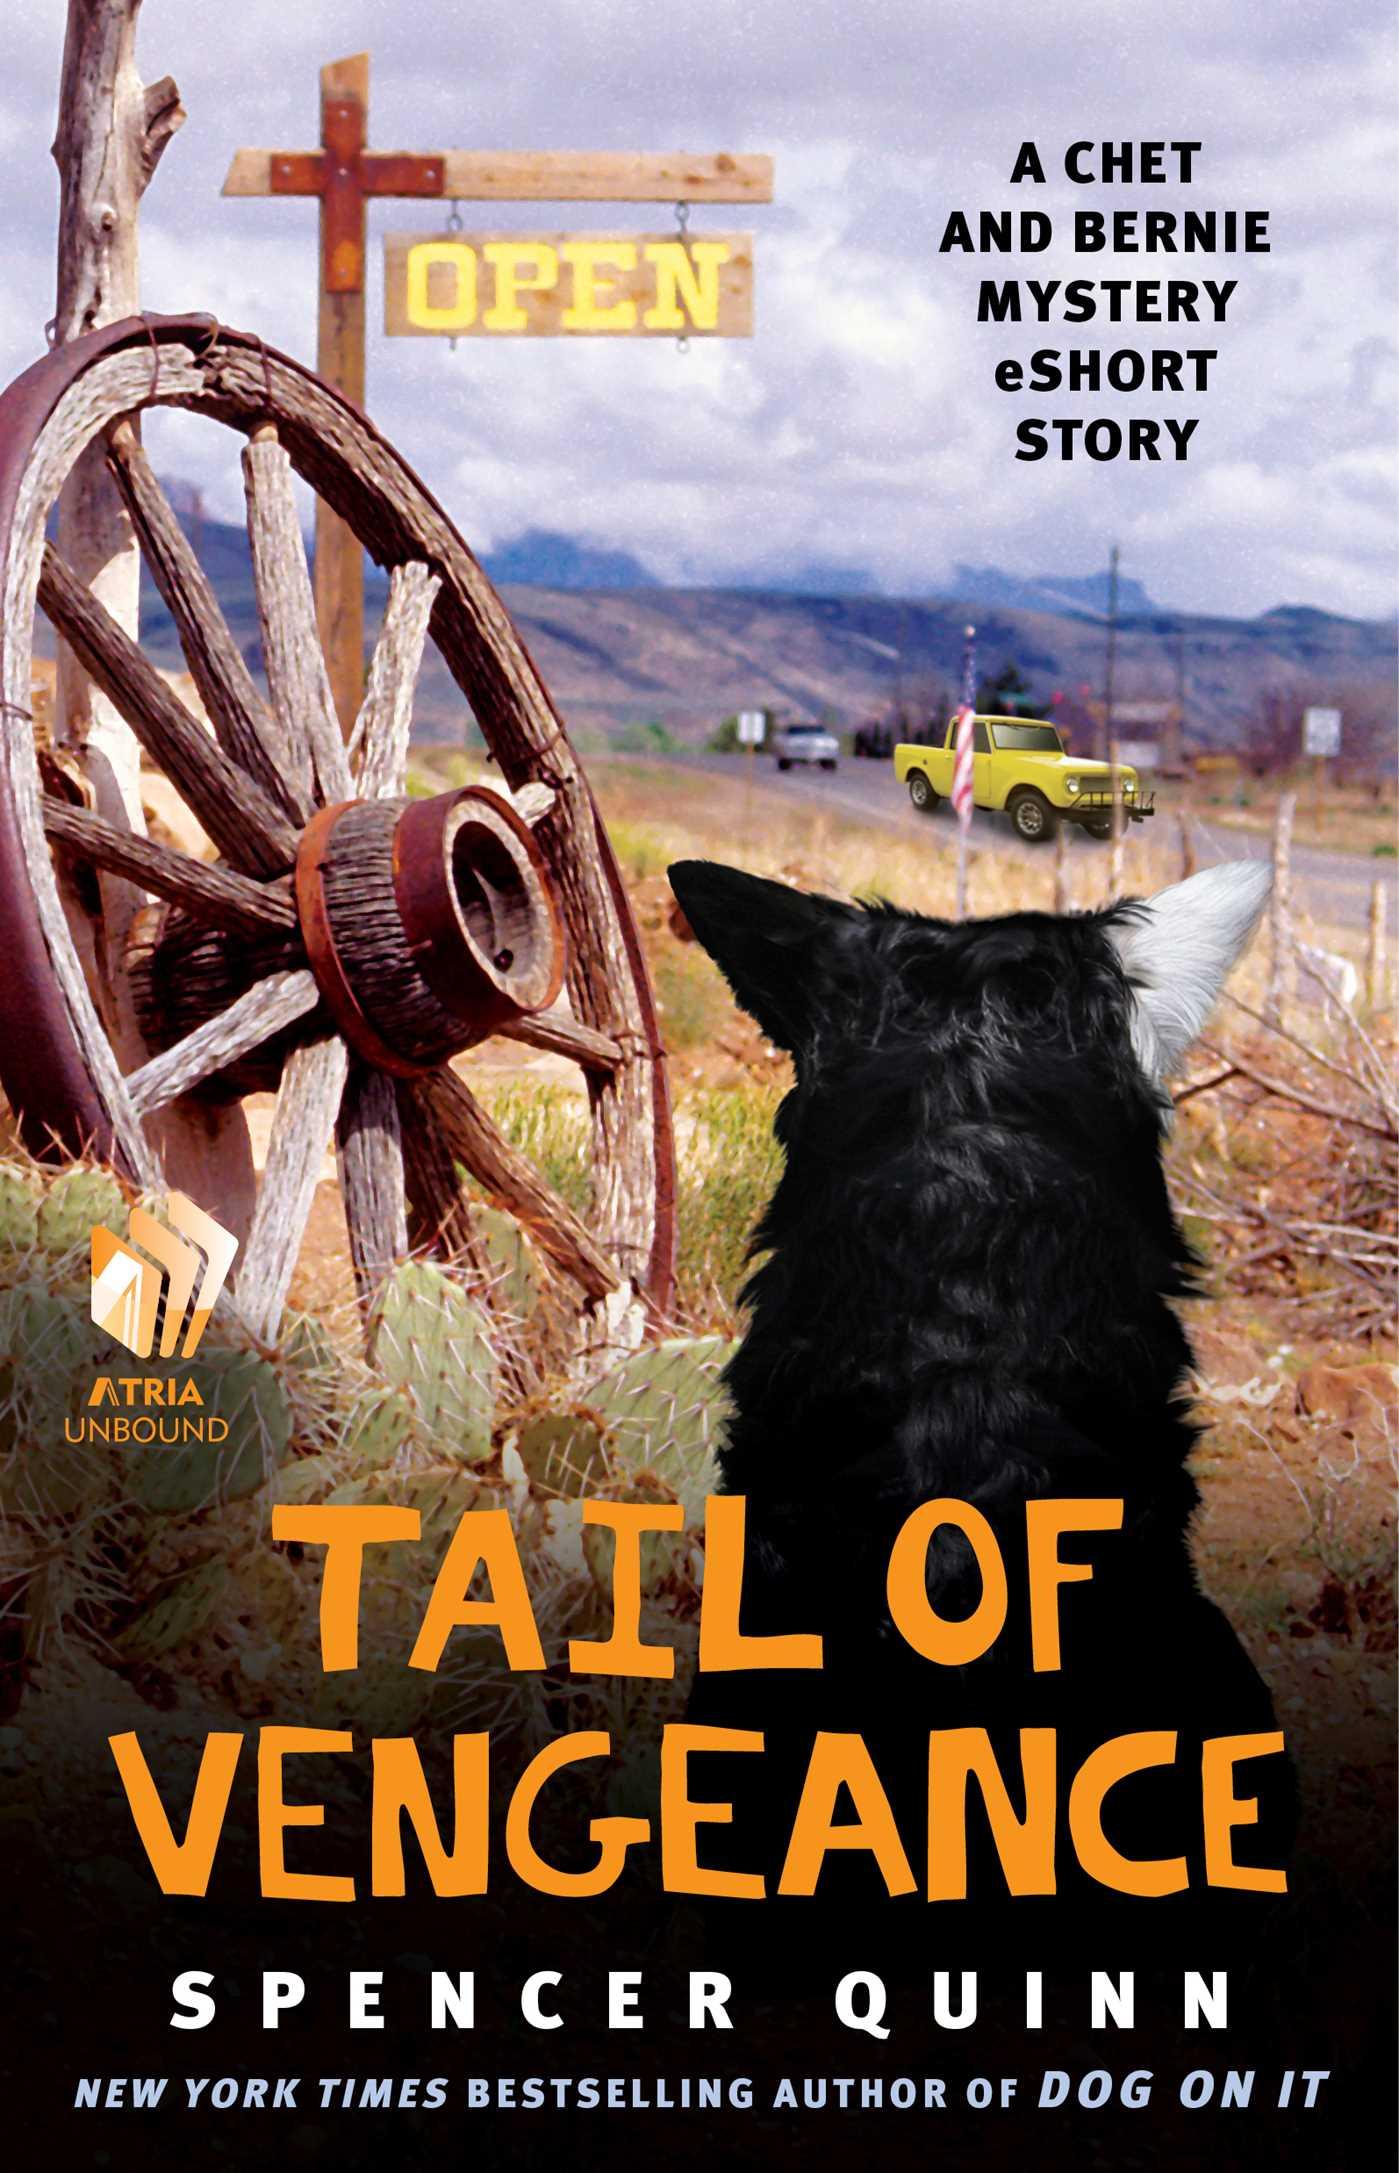 Tail of vengeance 9781476703633 hr